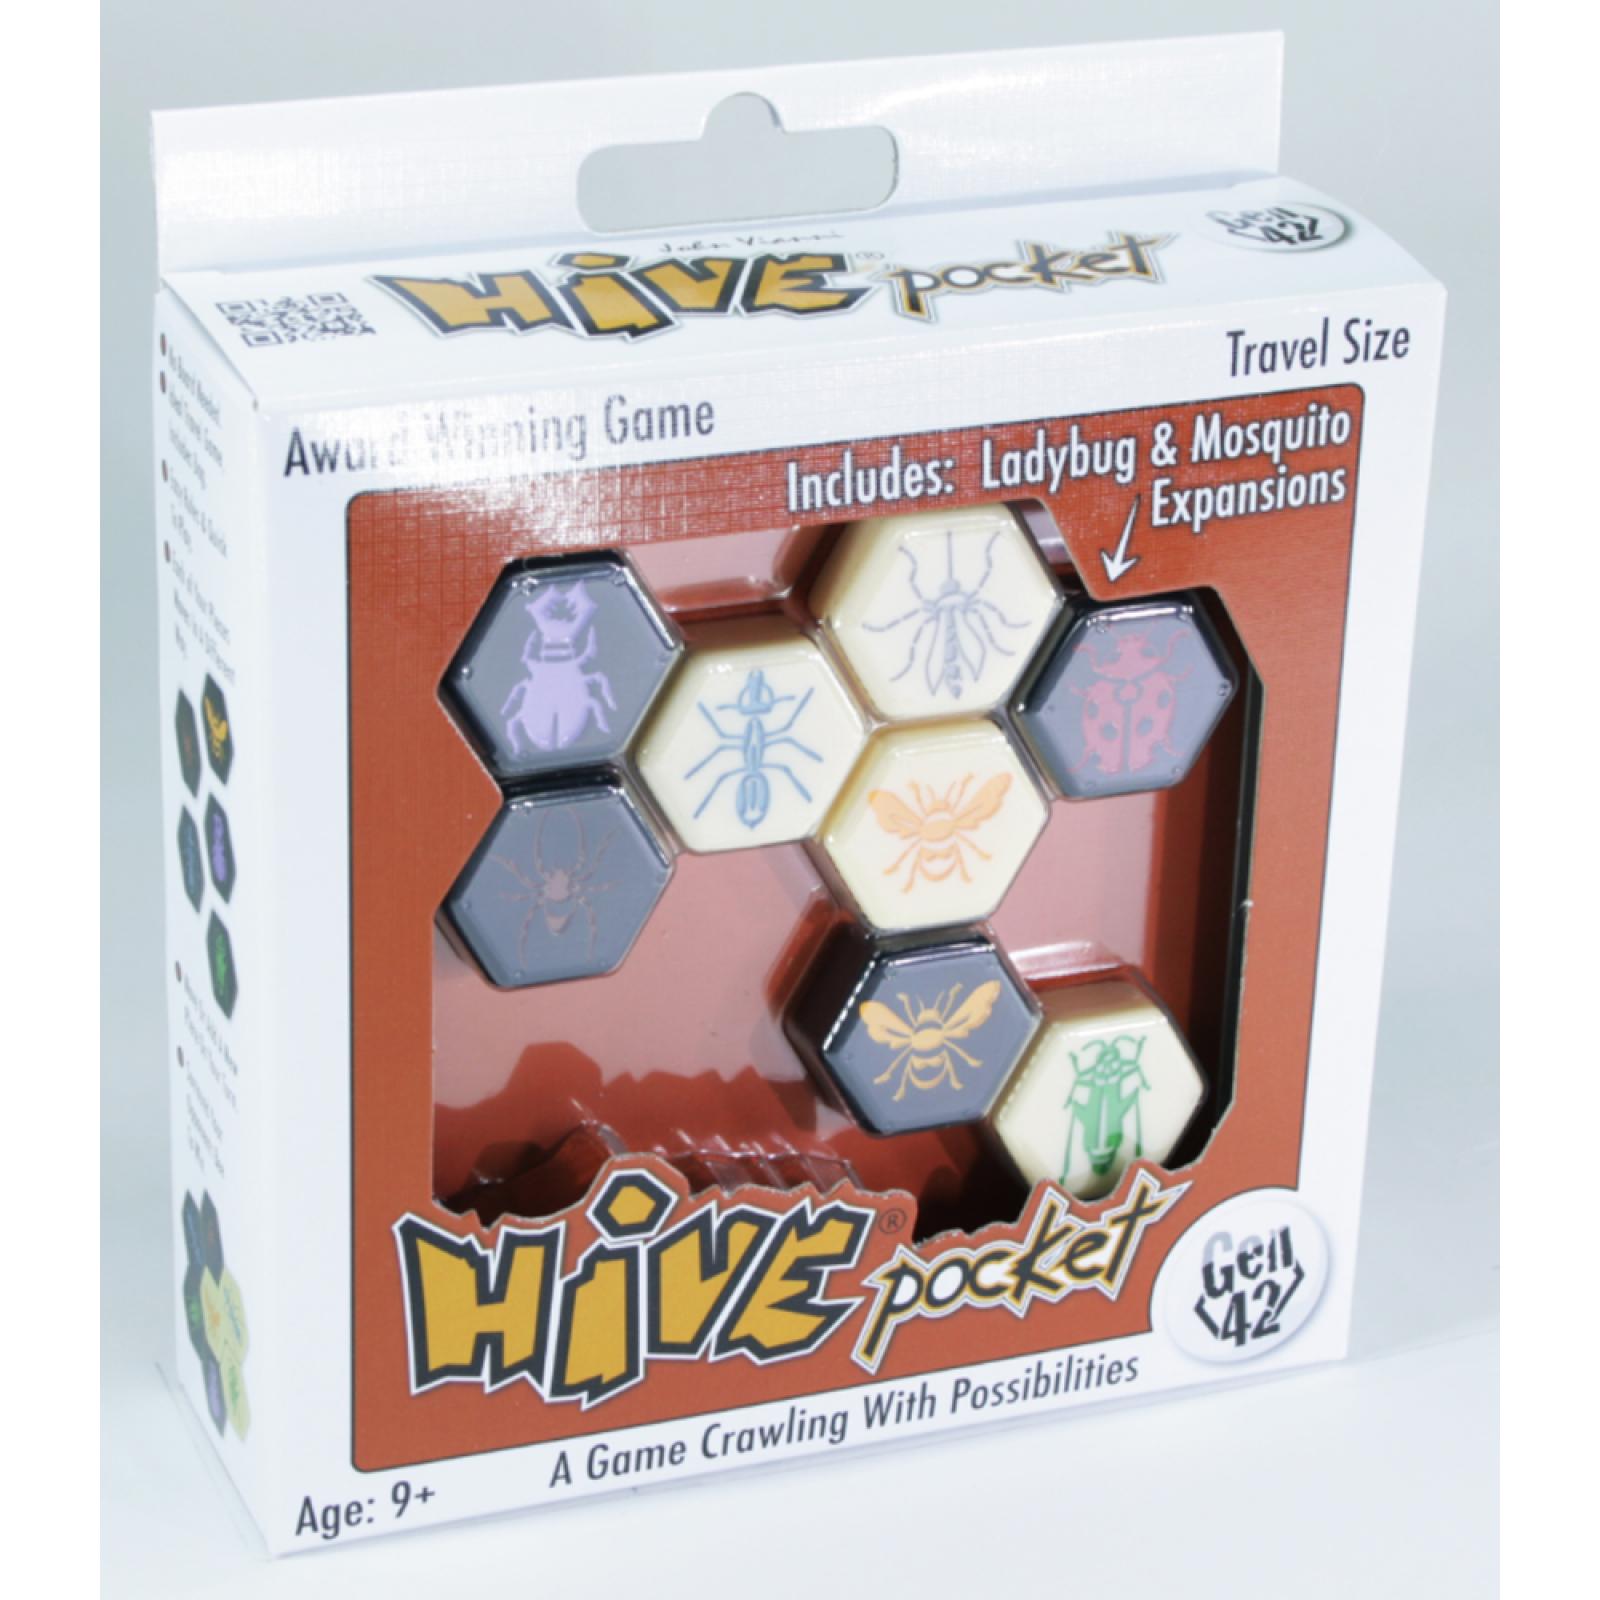 Hive Pocket Game 9yr+